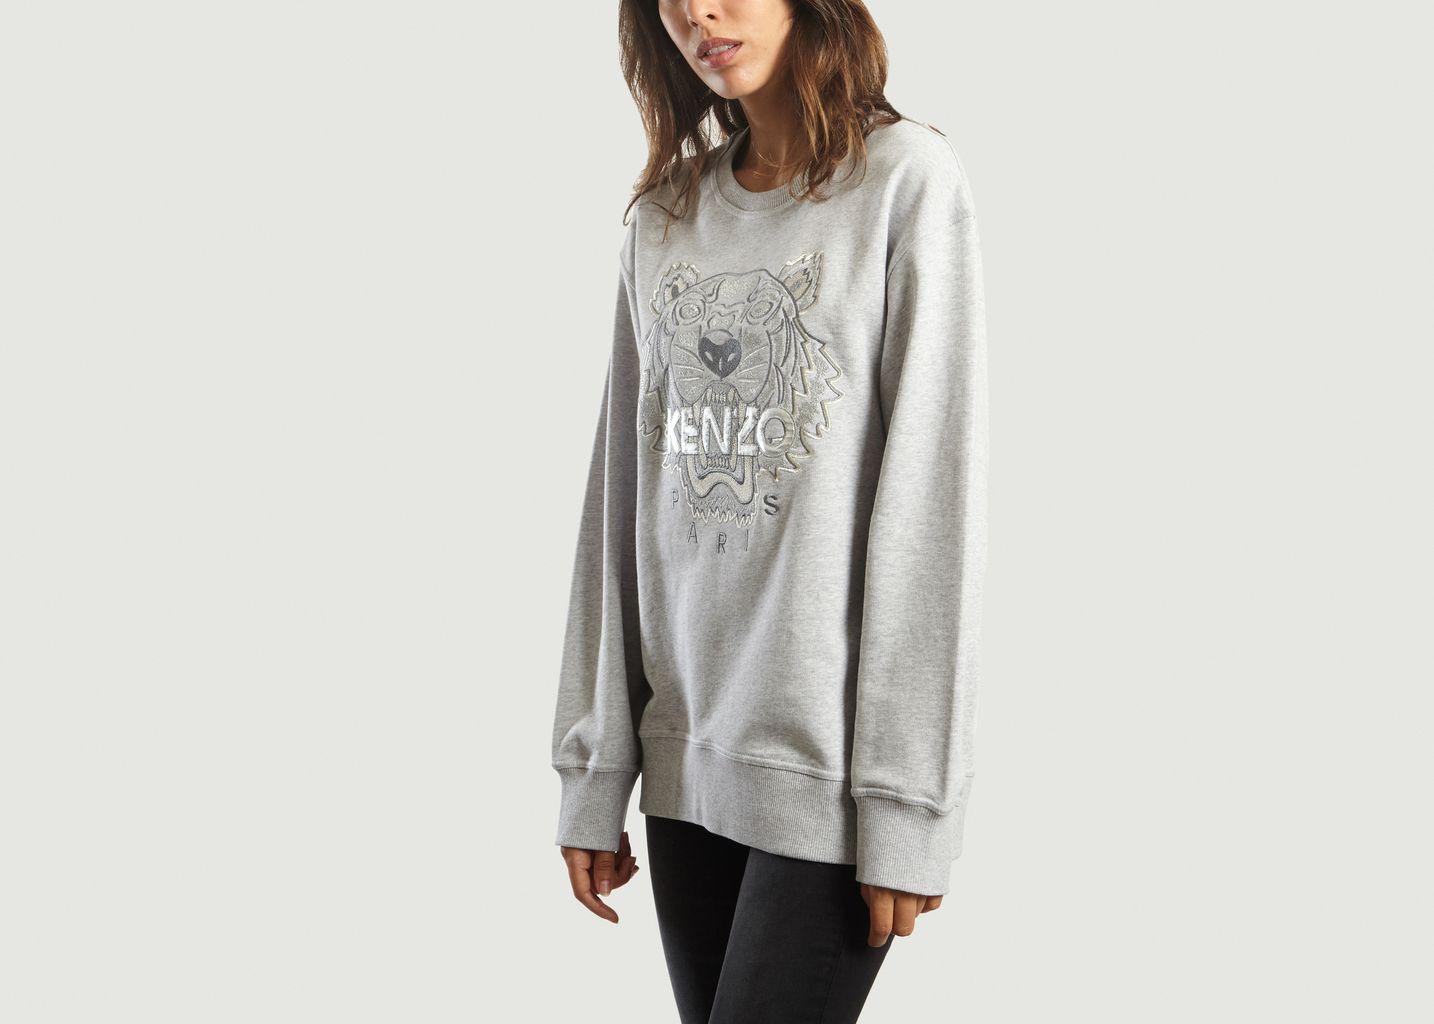 Iridescent Tiger Sweatshirt Light Grey Kenzo   L Exception f81eaf76ca1